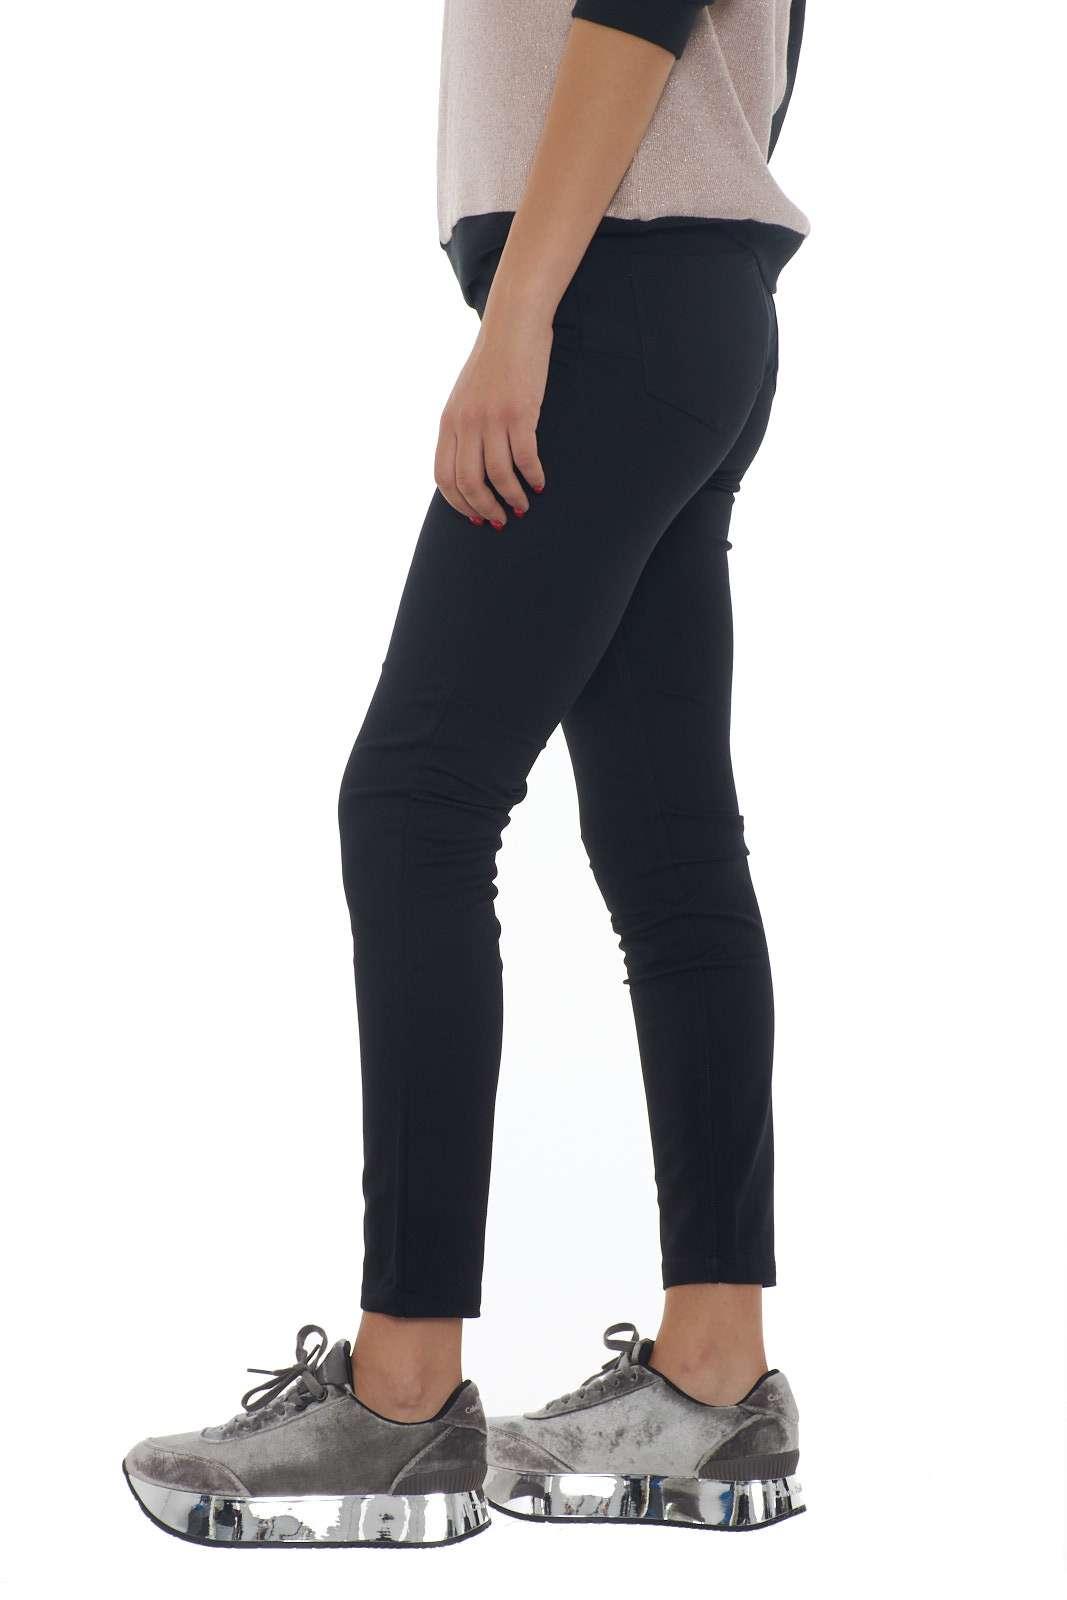 https://www.parmax.com/media/catalog/product/a/i/AI-outlet_parmax-pantaloni-donna-Liu-Jo-T69033-B_1.jpg